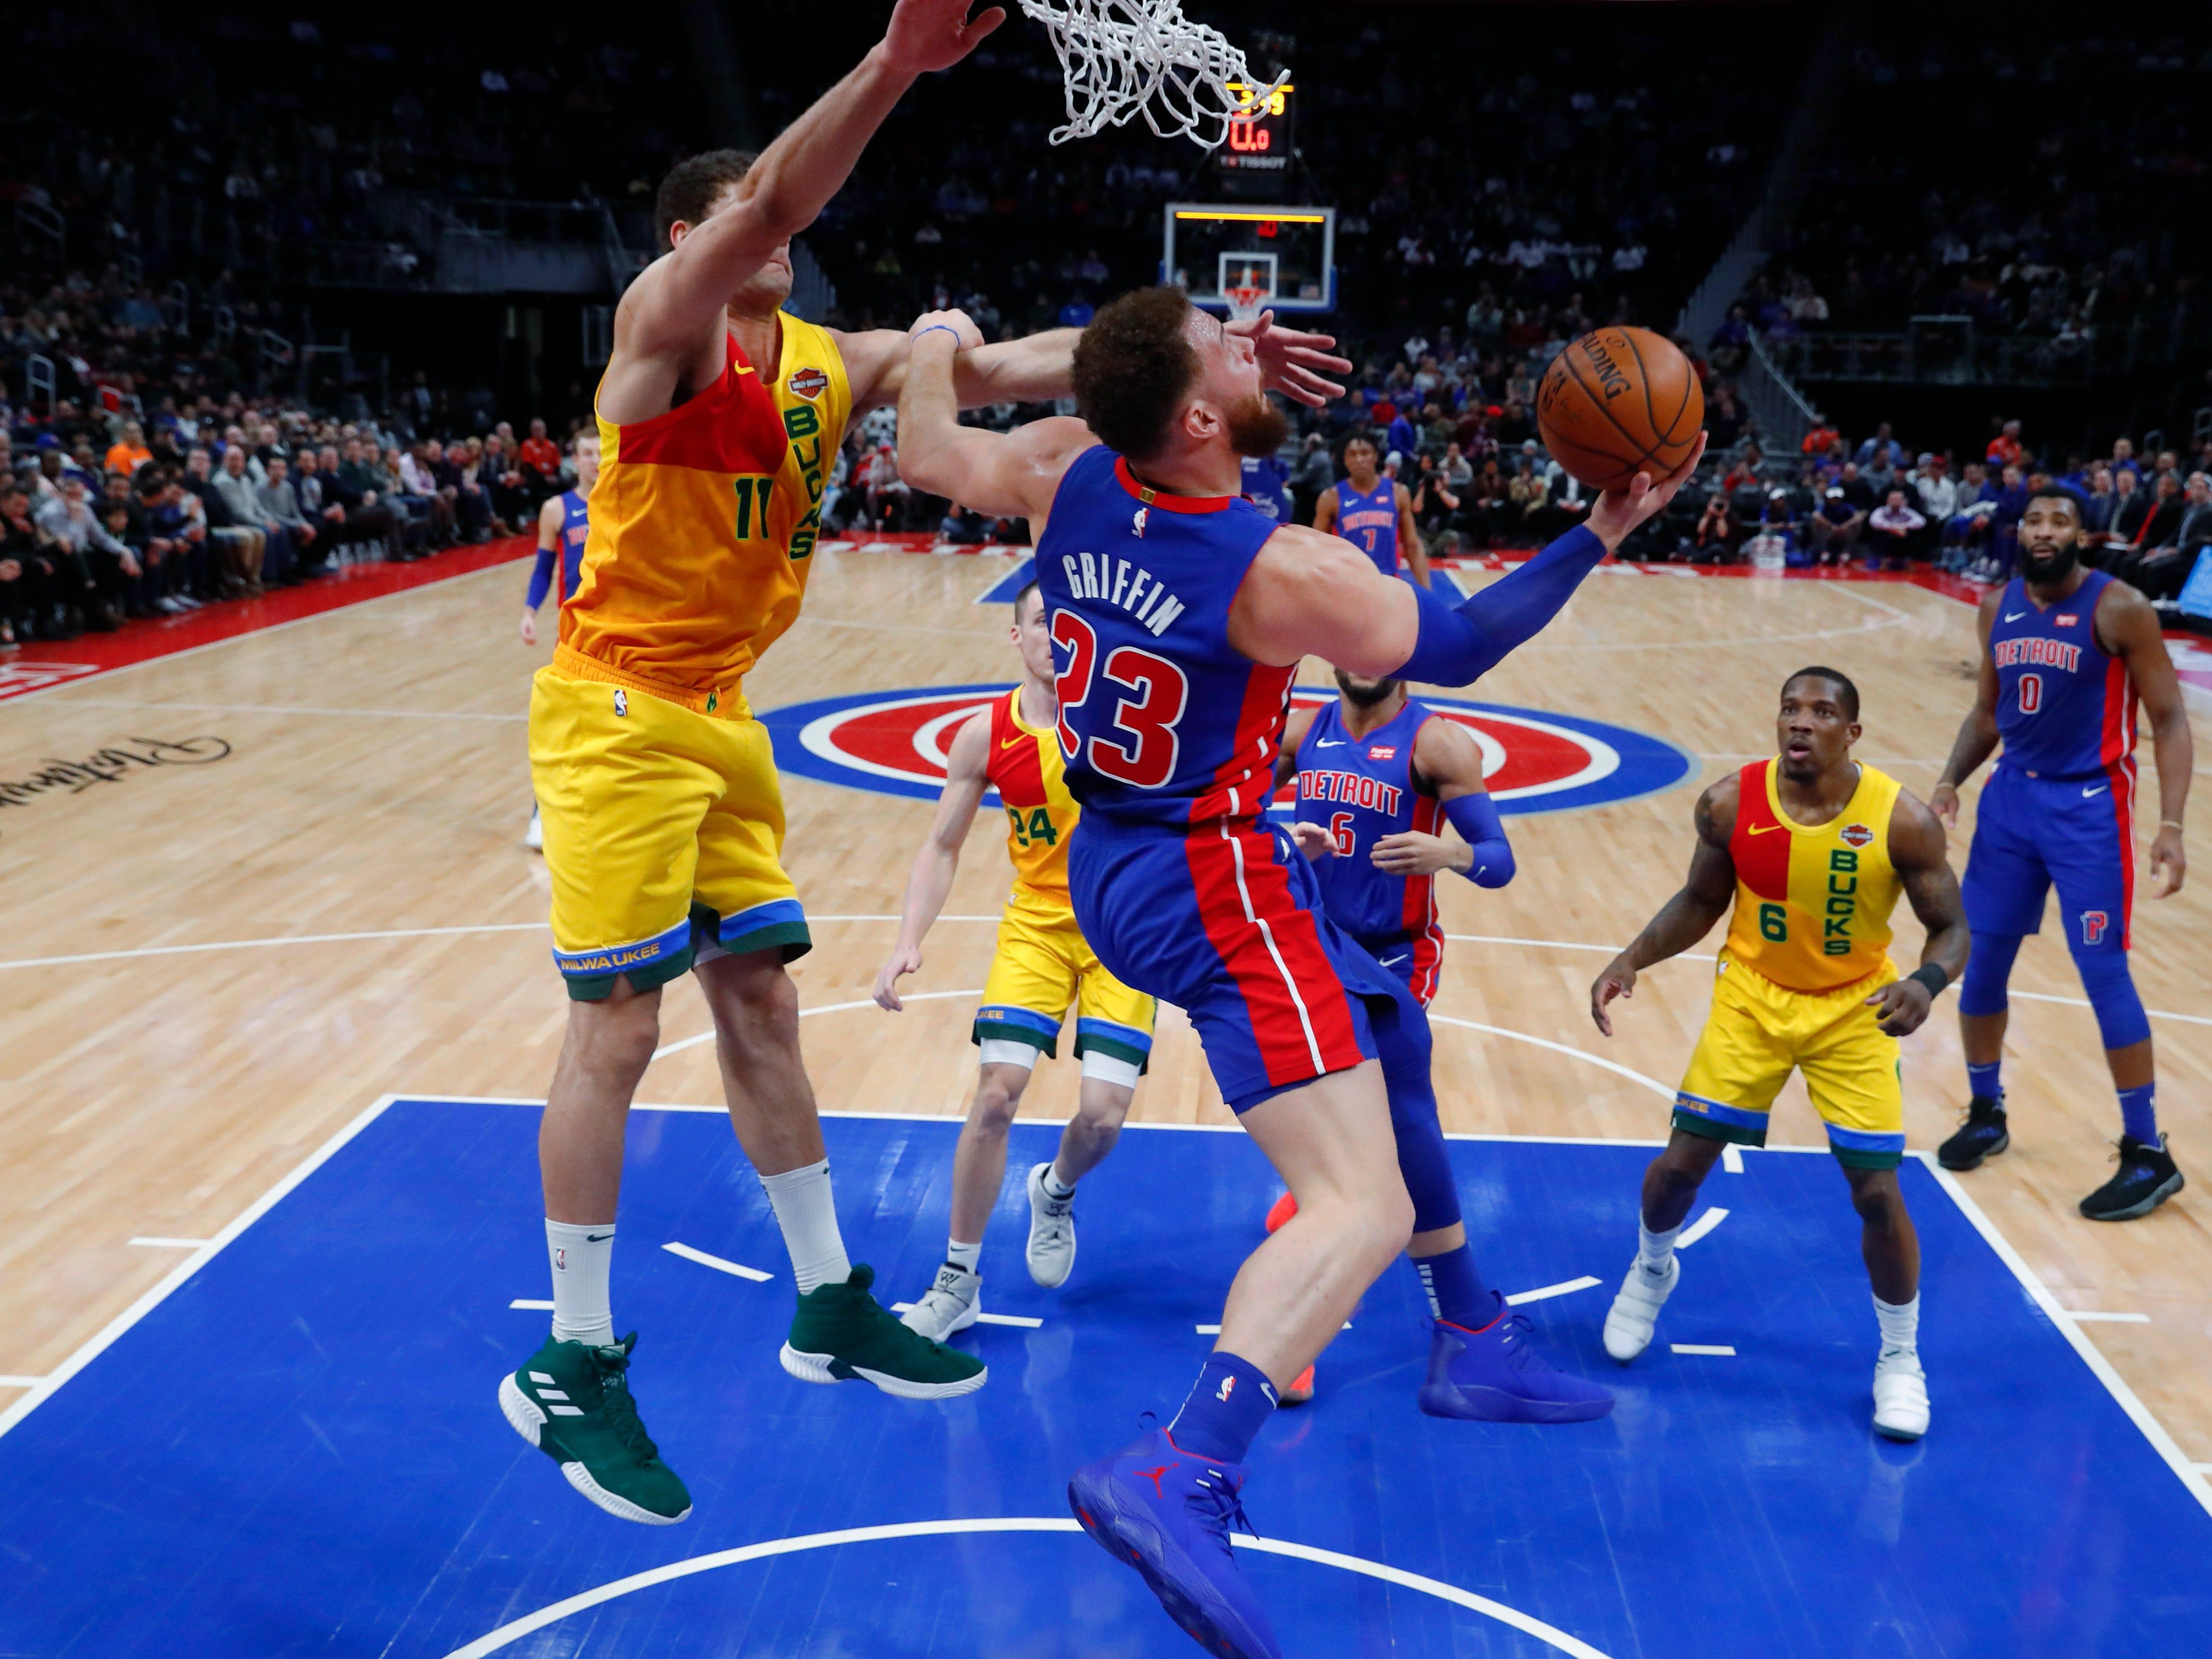 Pistons forward Blake Griffin drives on Bucks center Brook Lopez o Tuesday night.